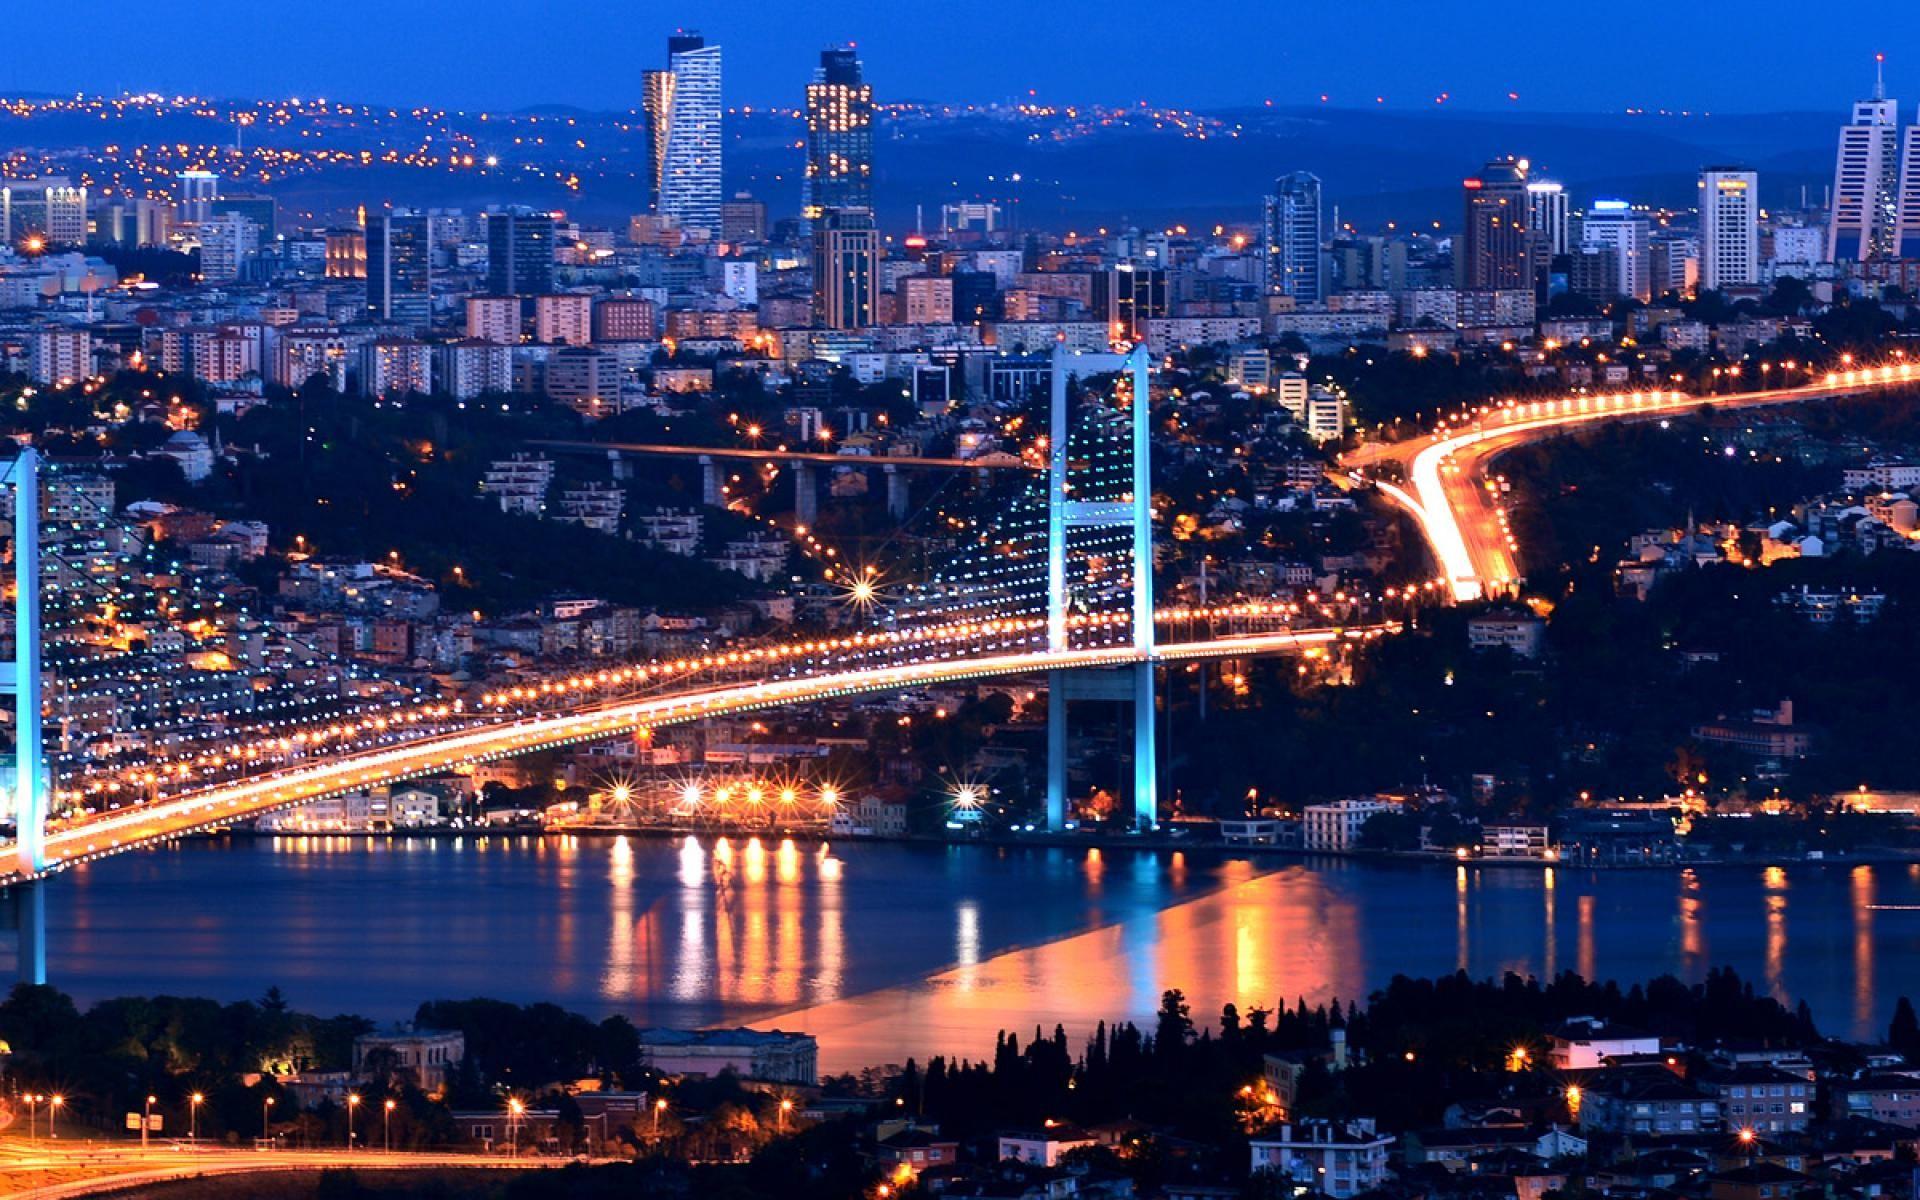 bridges turkey istanbul 2000x1333 wallpaper High Quality ...